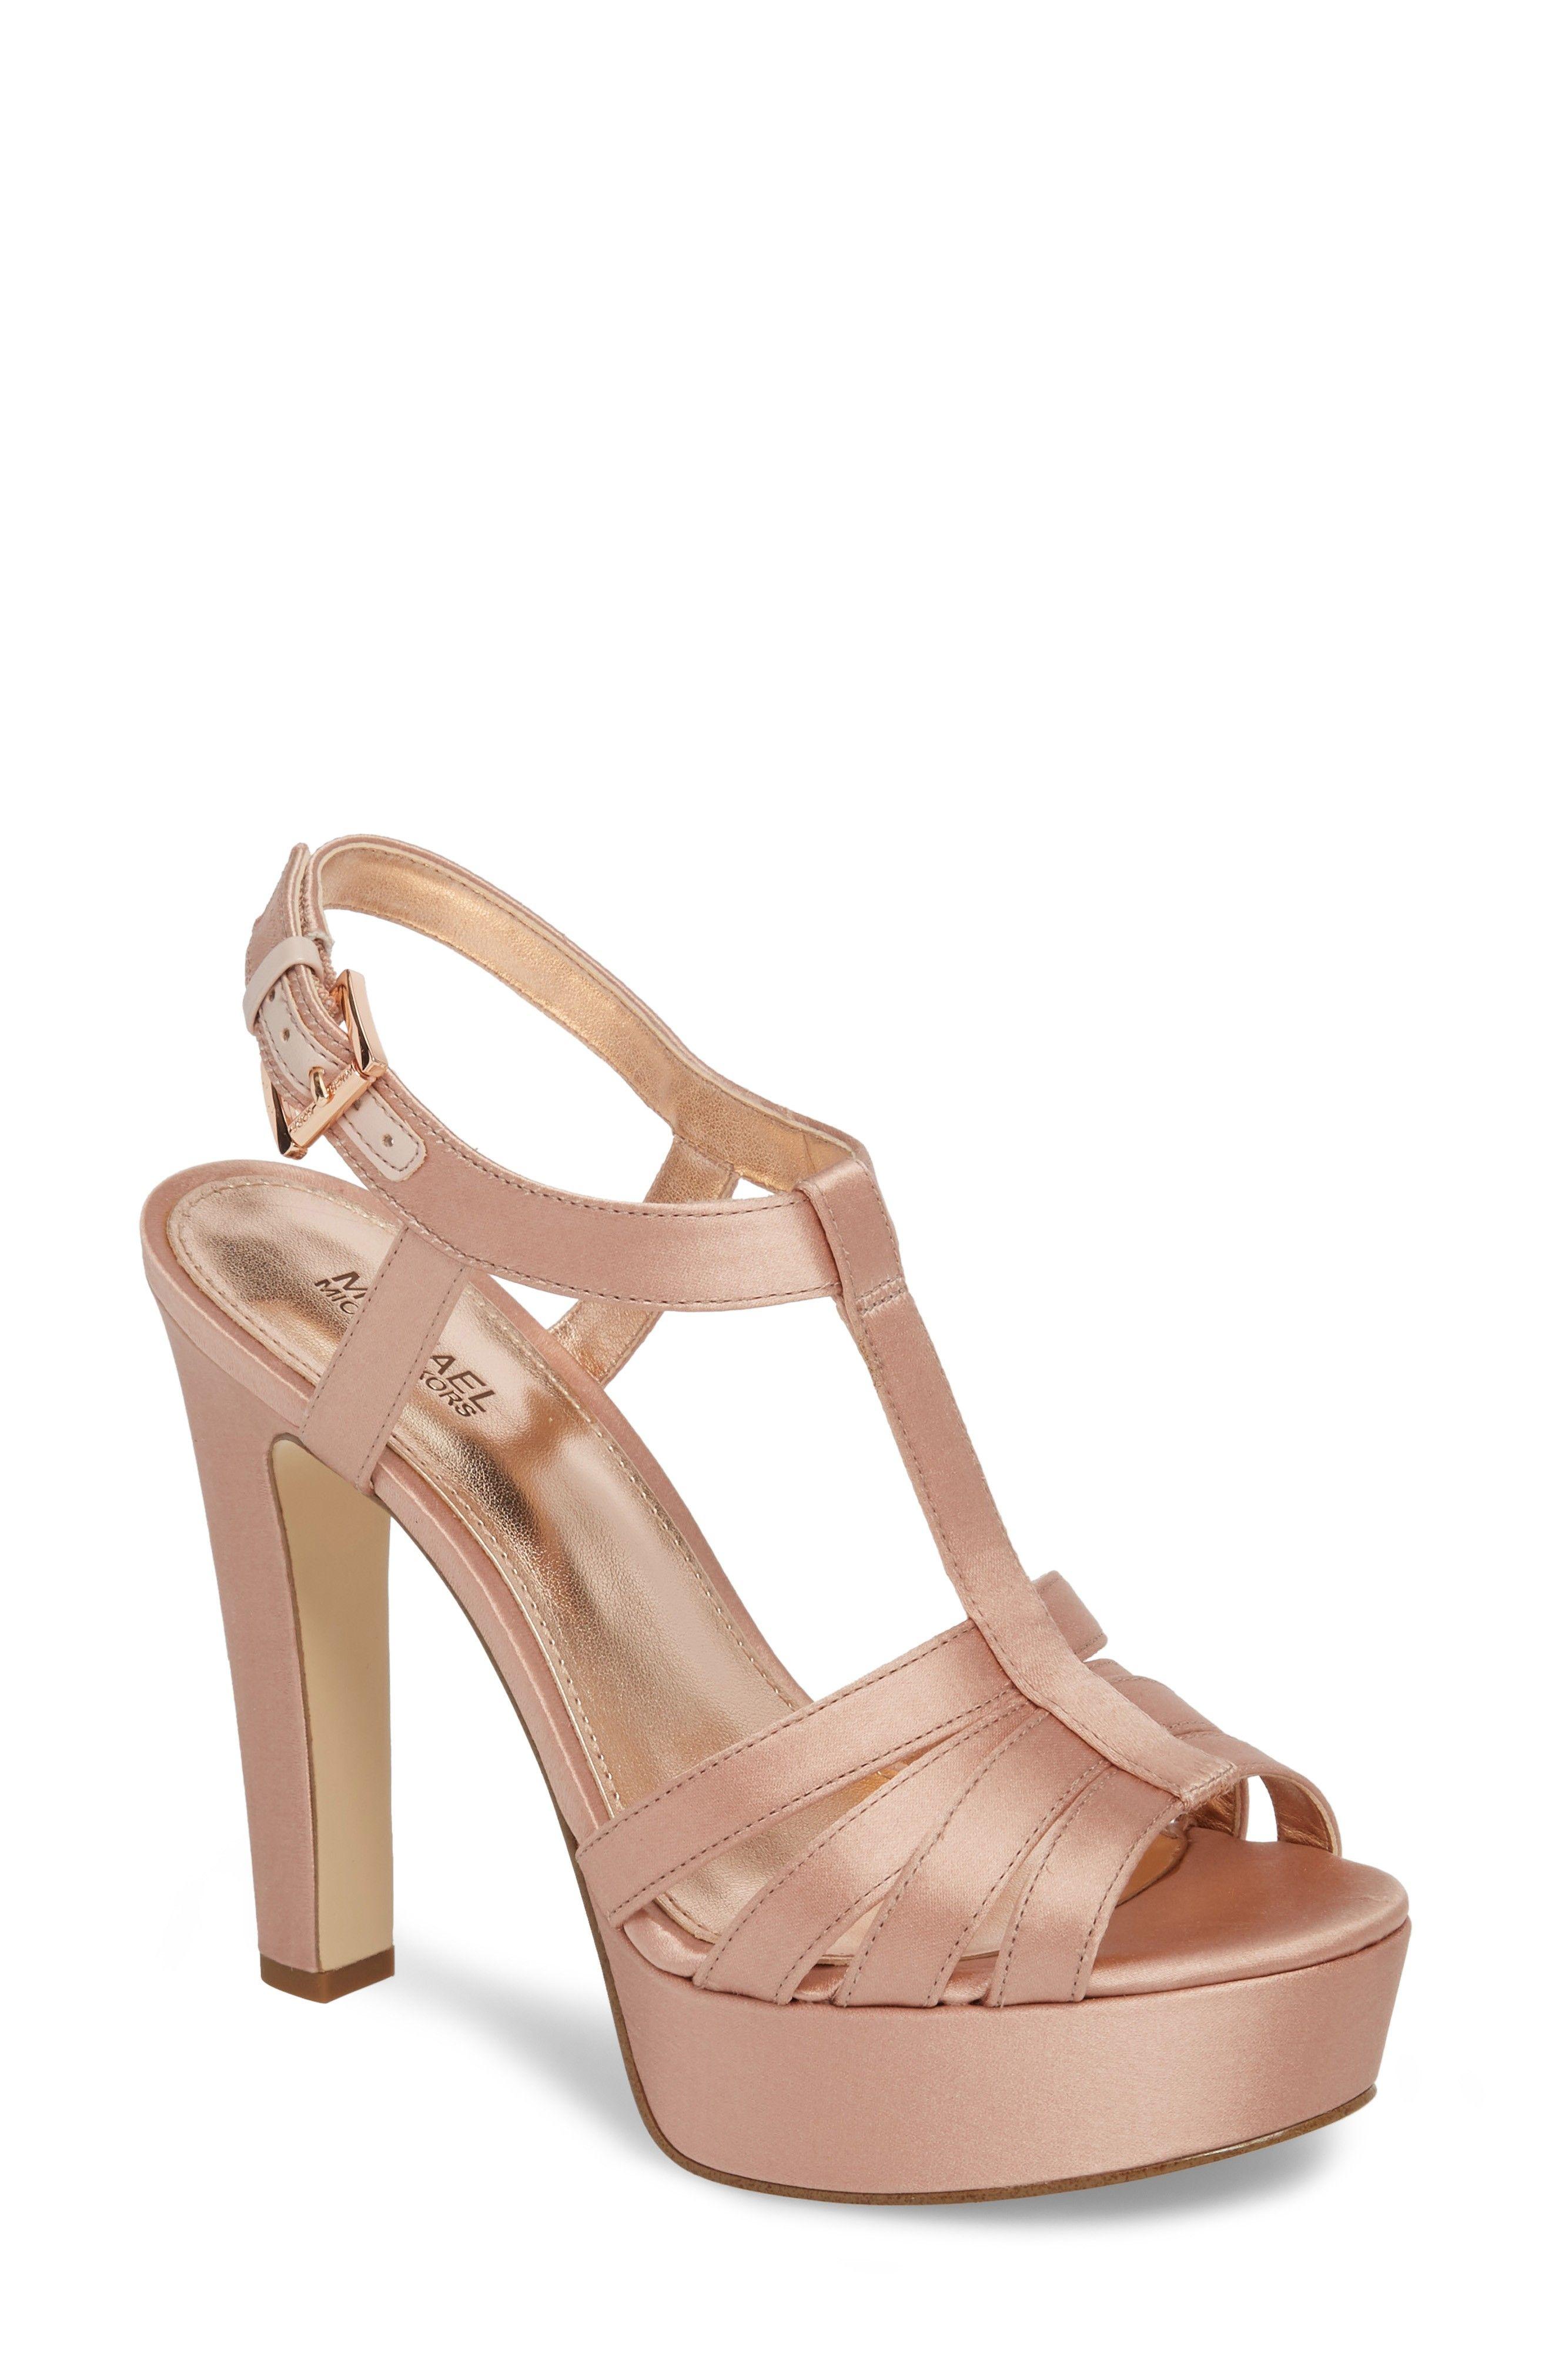 4a118836b0191 Shop MICHAEL MICHAEL KORS Catalina Platform Sandal